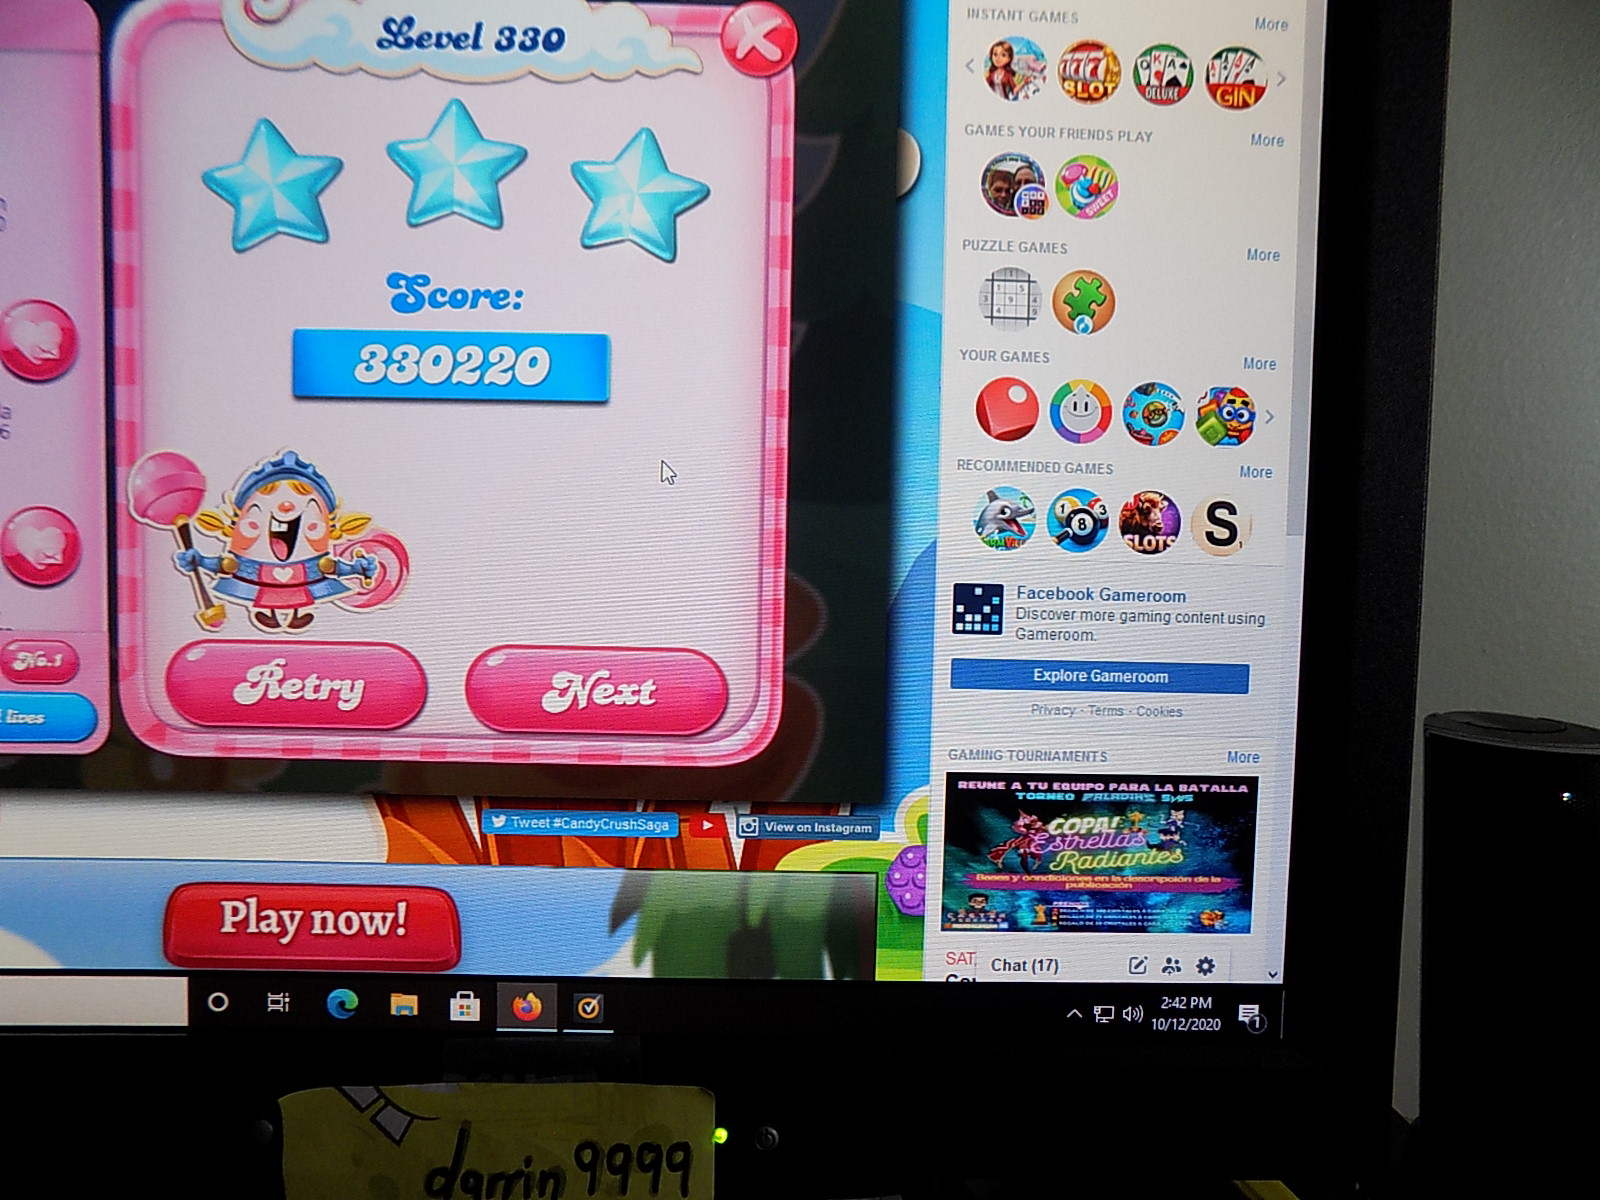 Candy Crush Saga: Level 330 330,220 points